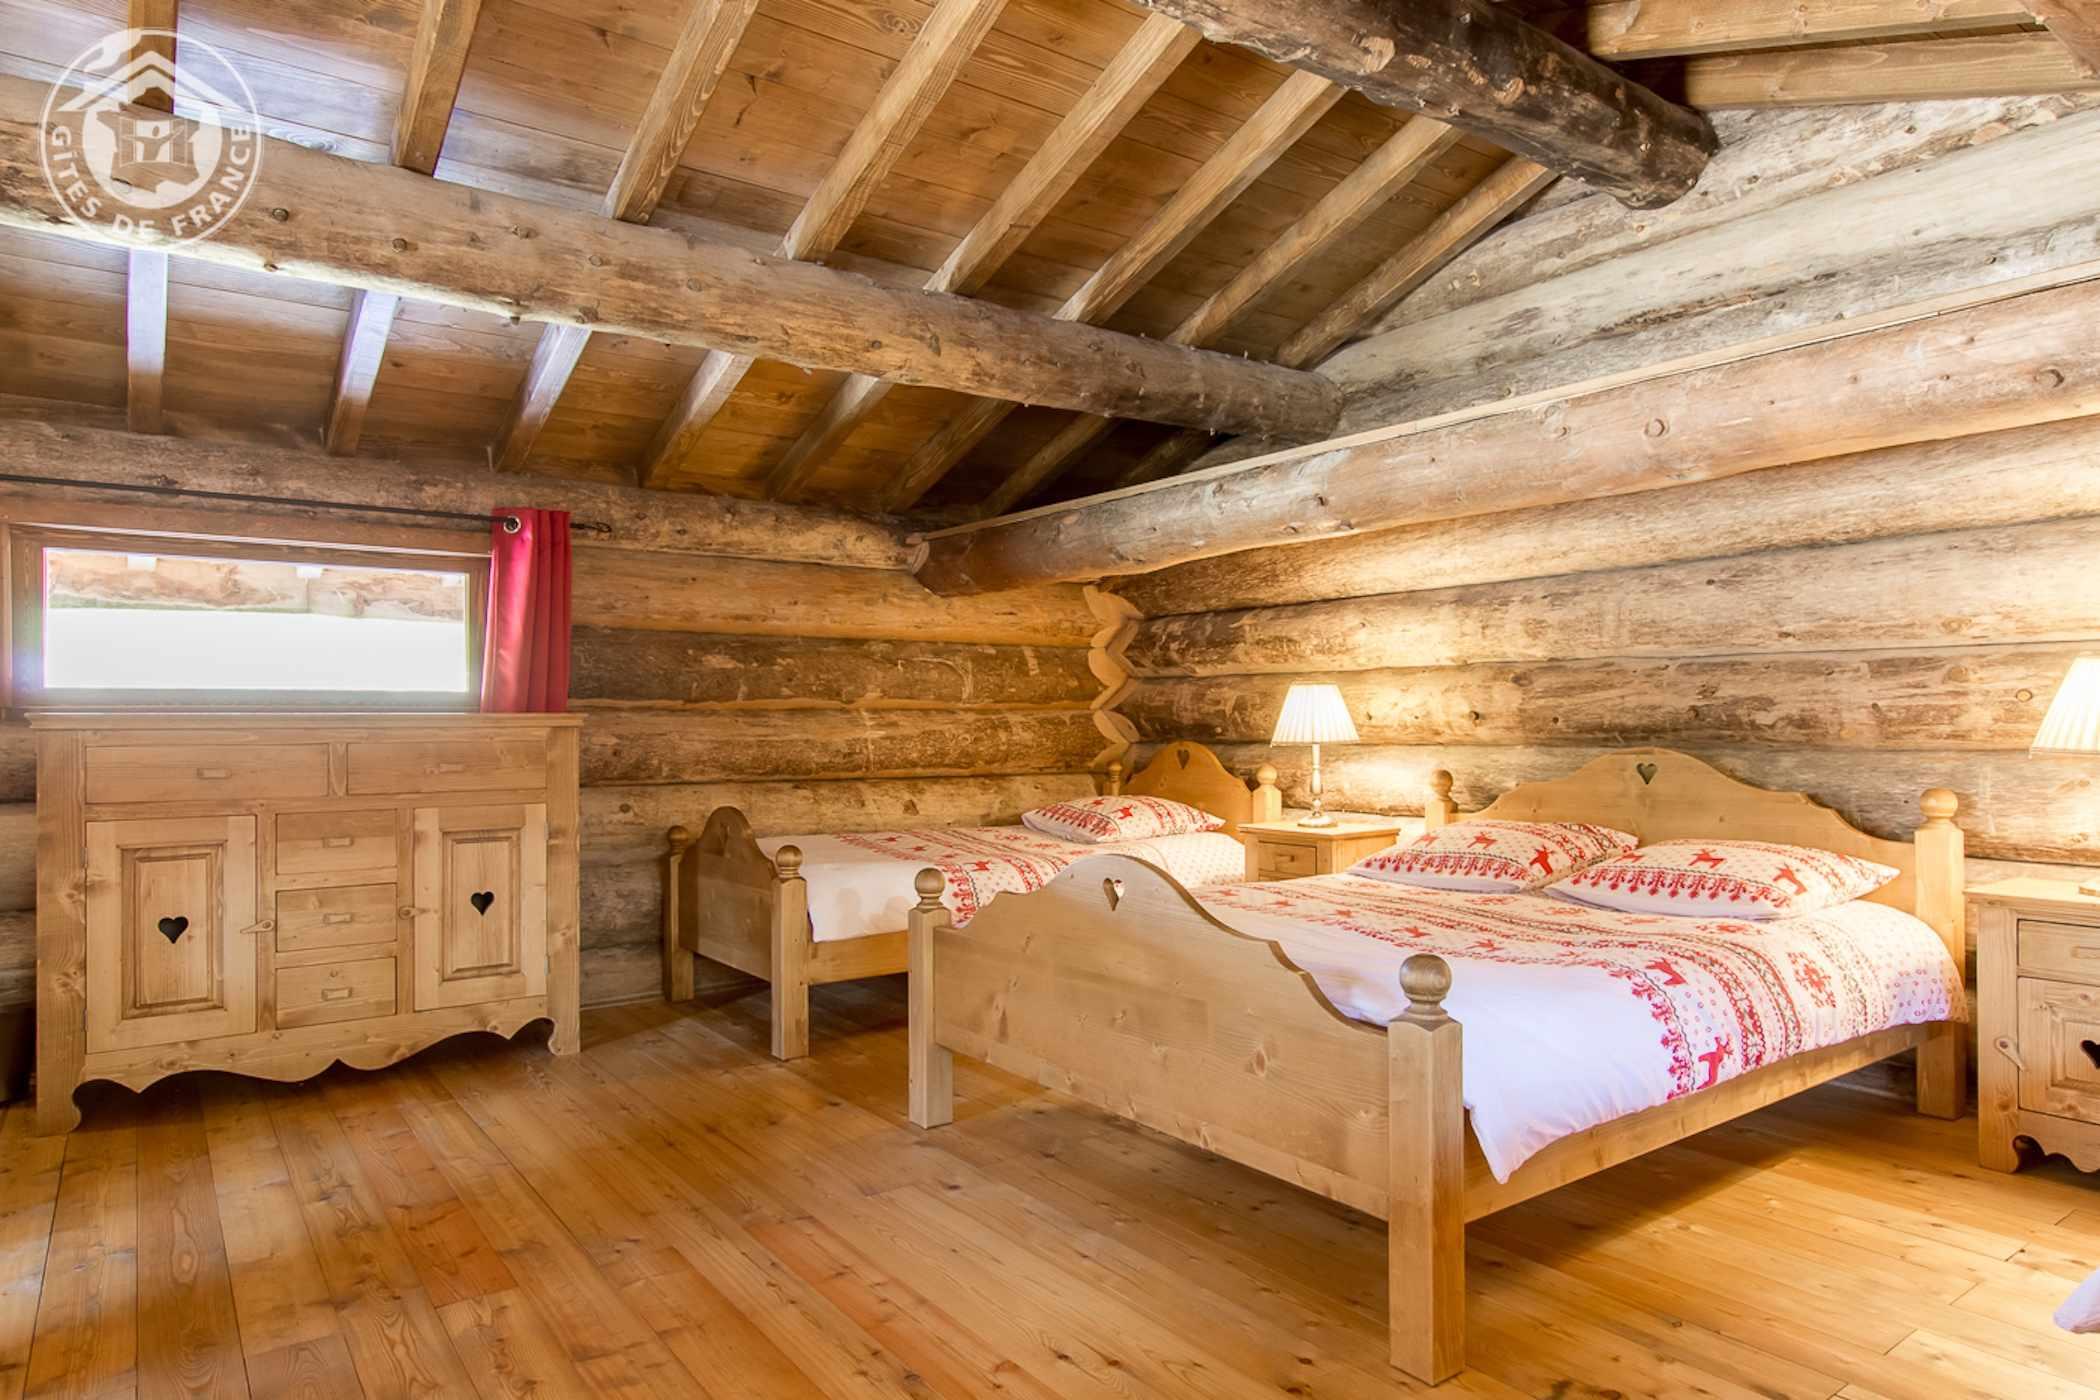 Ma cabane en montagne cabanes de france for Ma cabane en bois